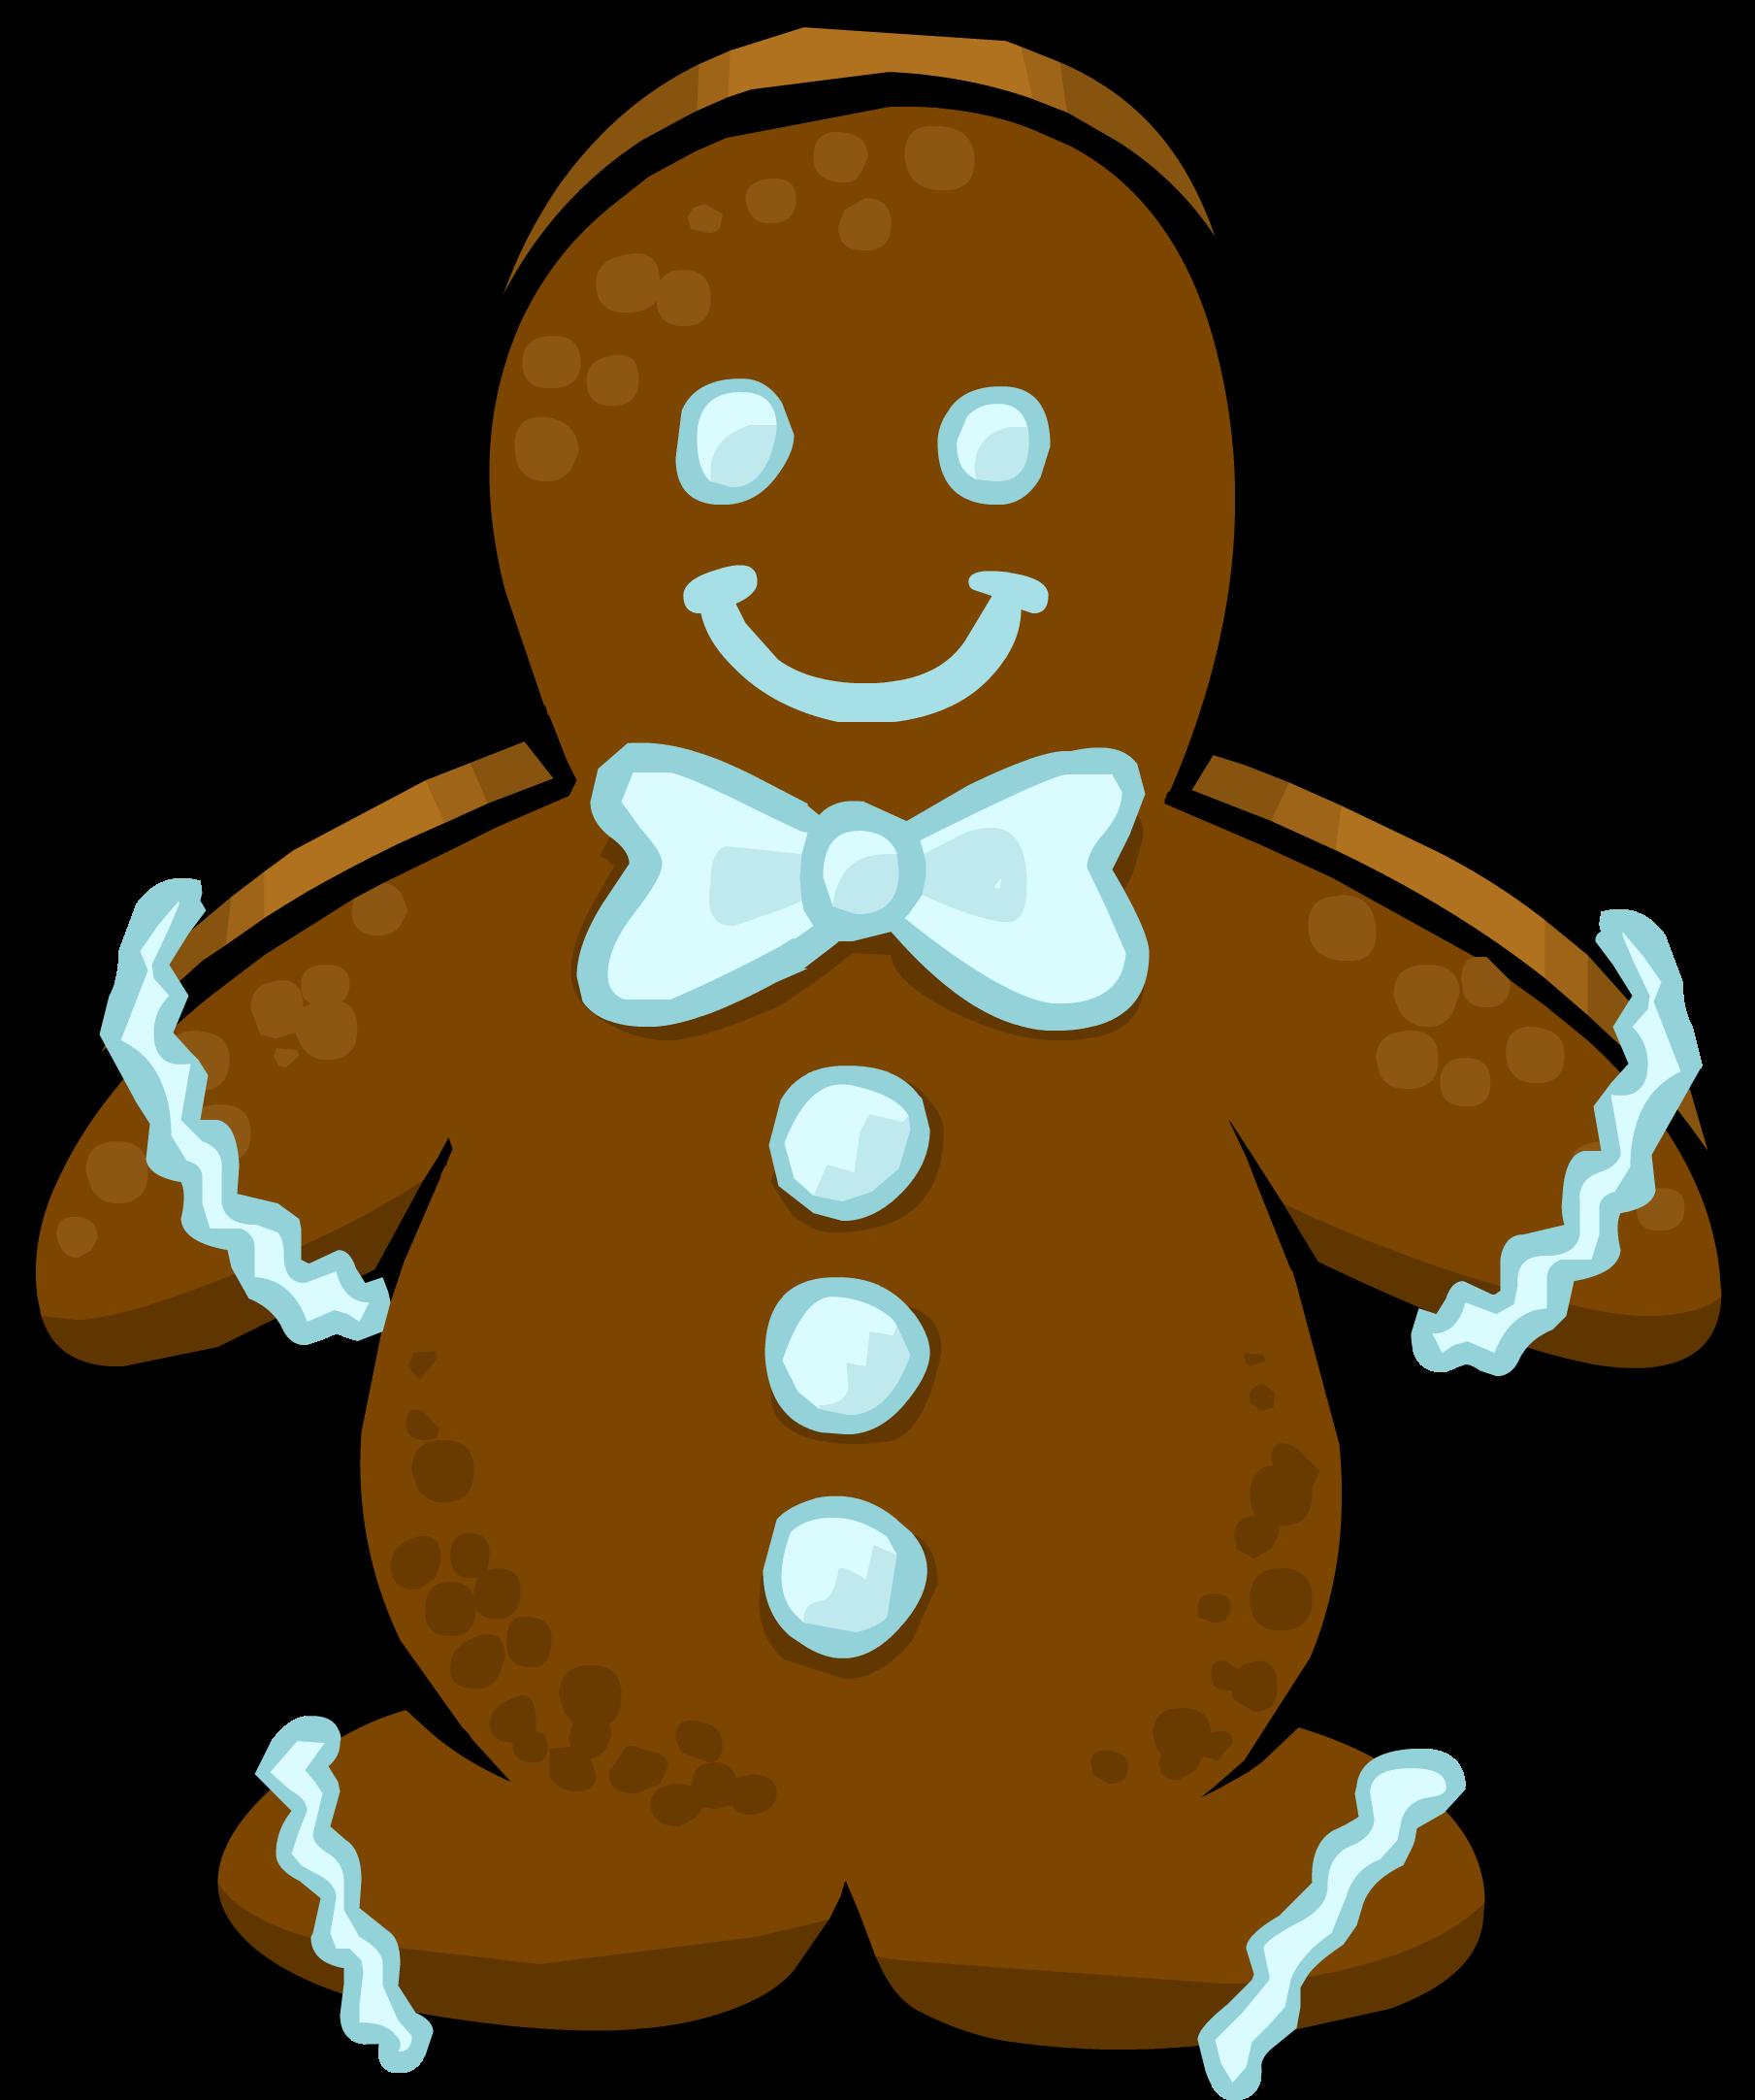 Transparent gingerbread man clipart - Dojo Clipart Gingerbread - Gingerbread Man Sprite